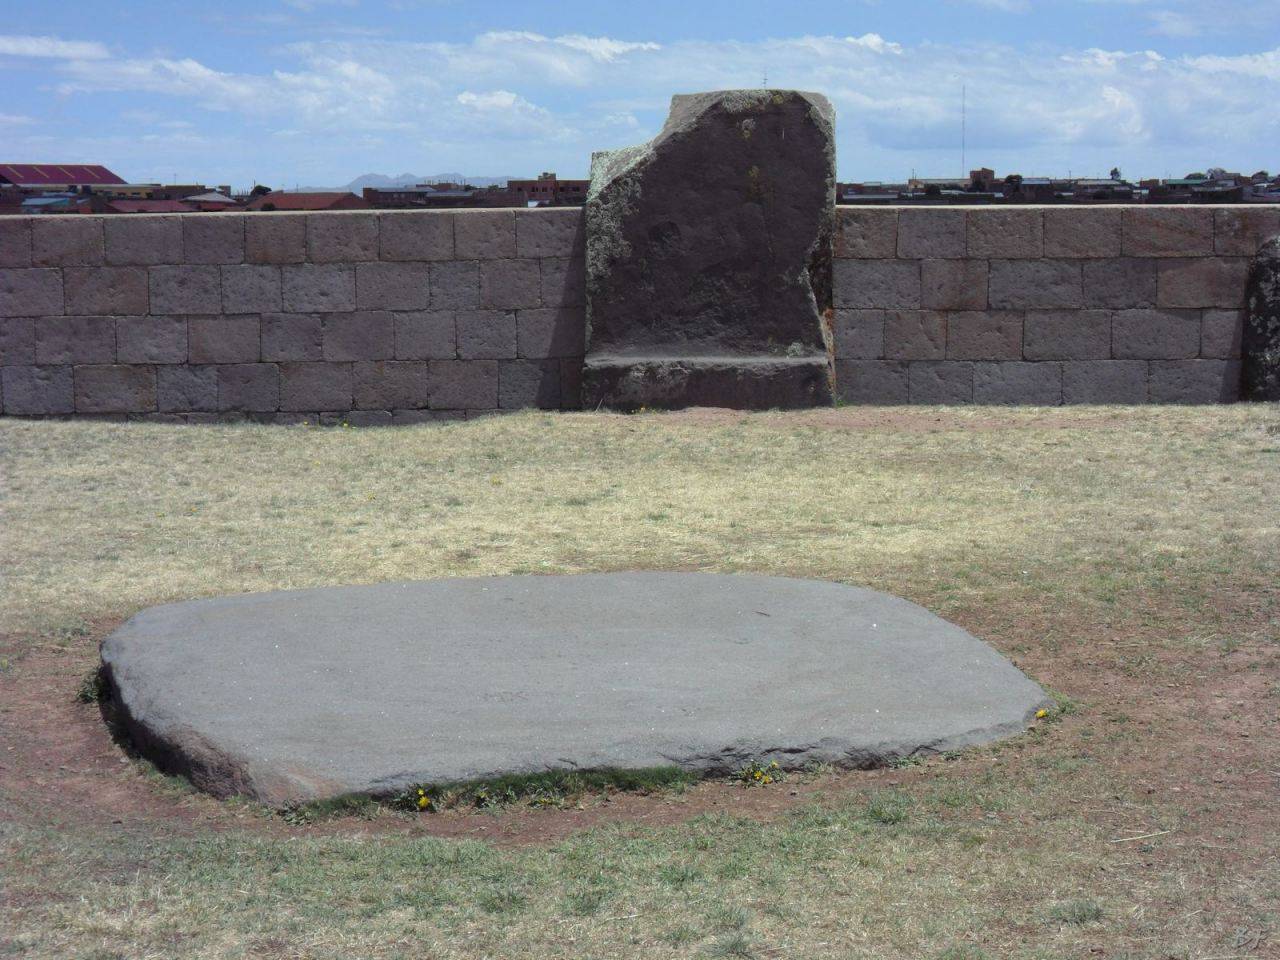 Sito-Megalitico-Piramide-Akapana-Kalasasaya-Menhir-Tiahuanaco-Bolivia-49